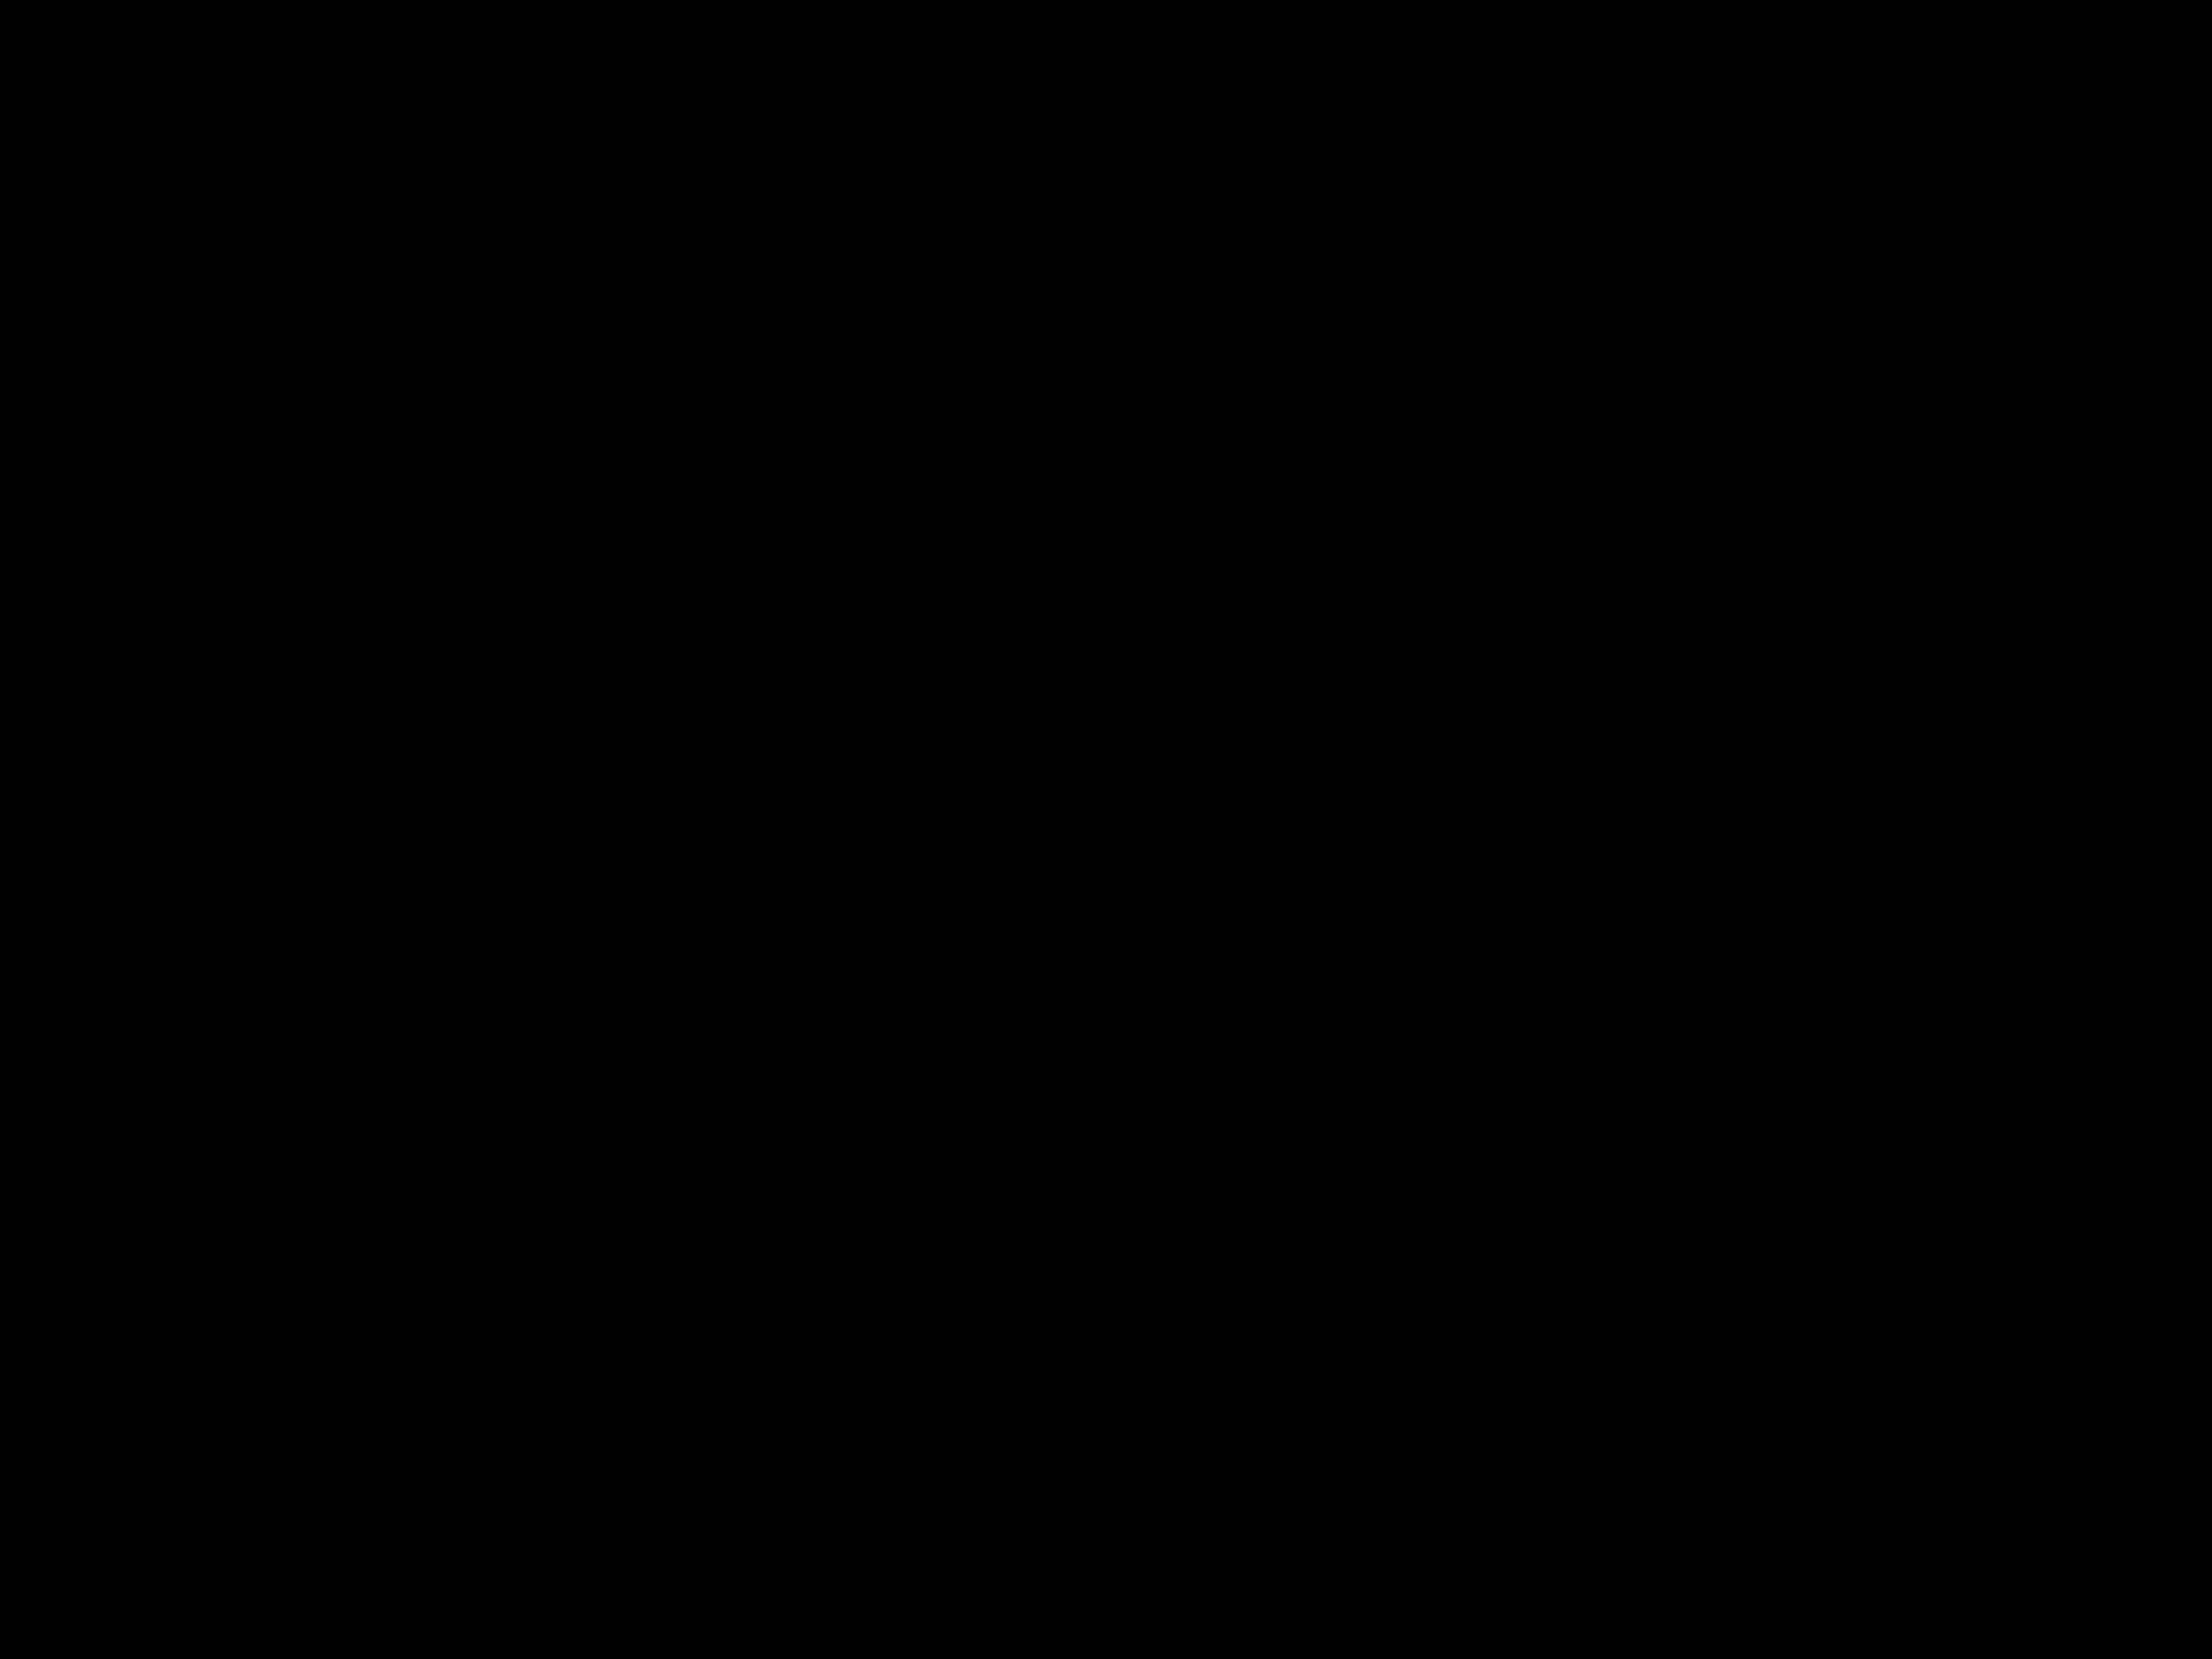 img_3225